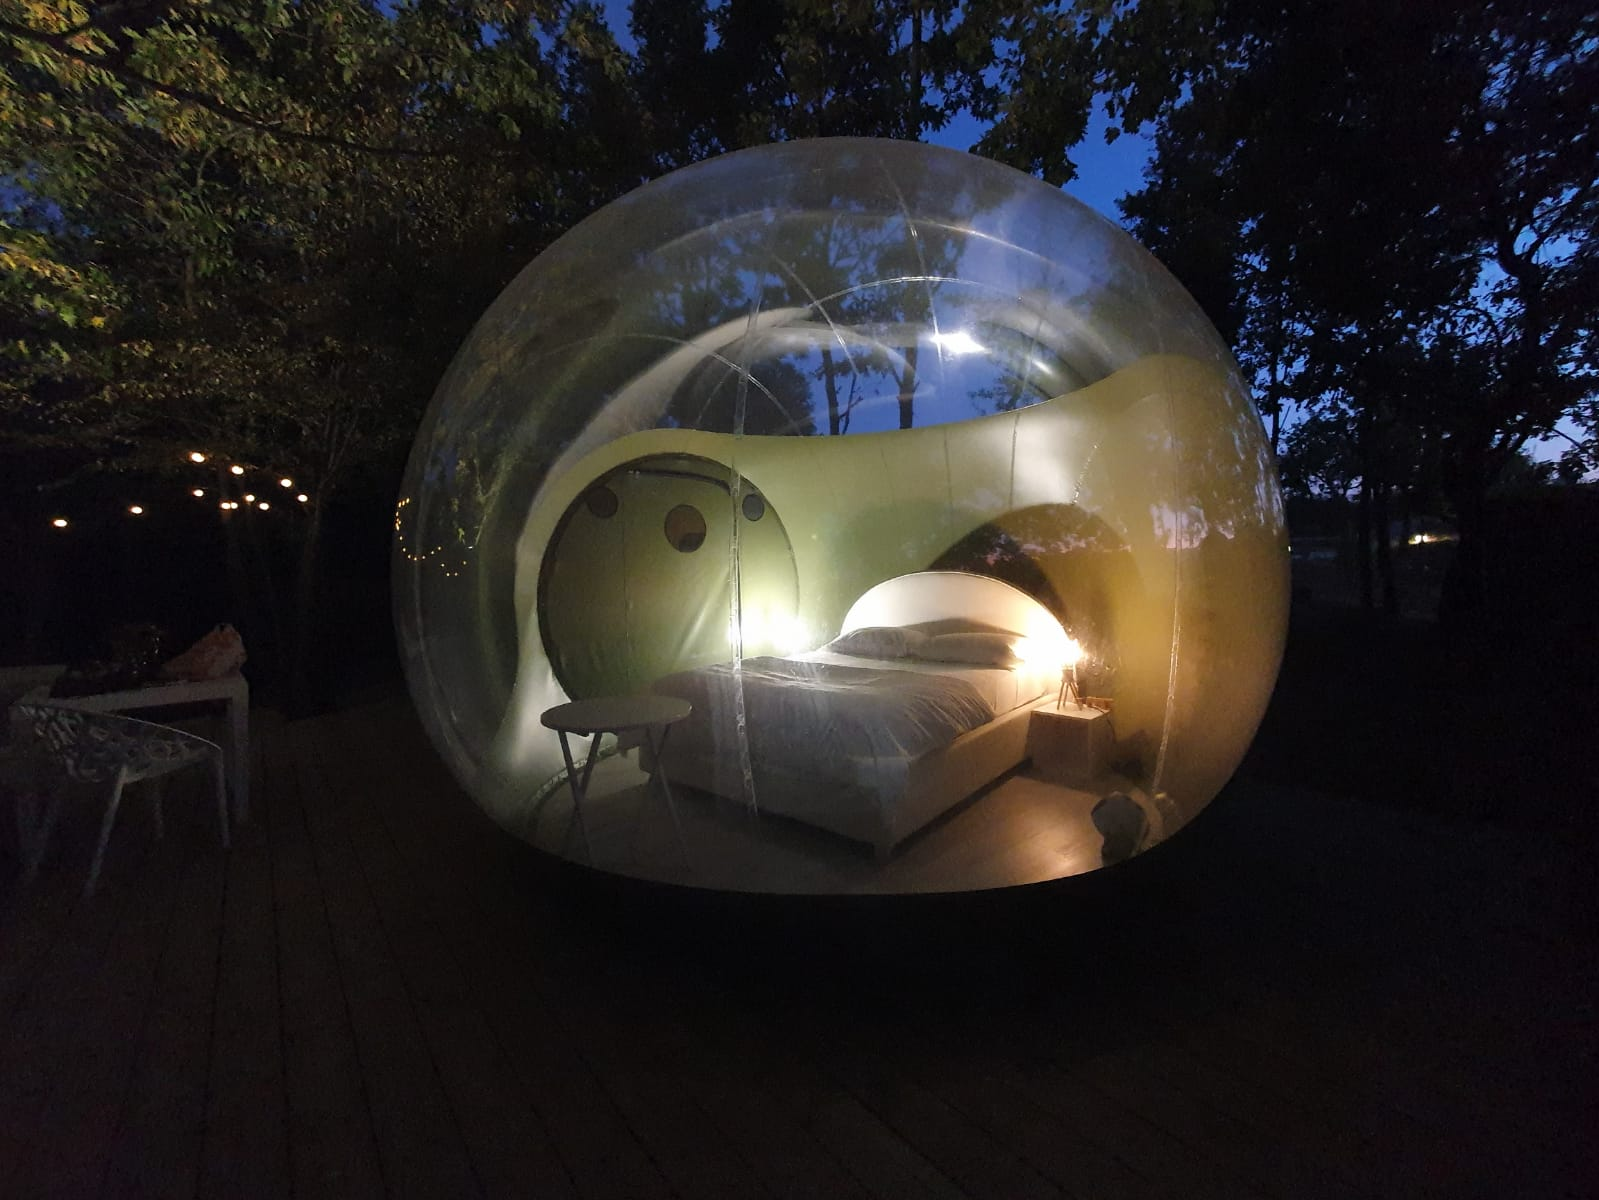 Atmosfera Bubble Glamping di notte - neomag.